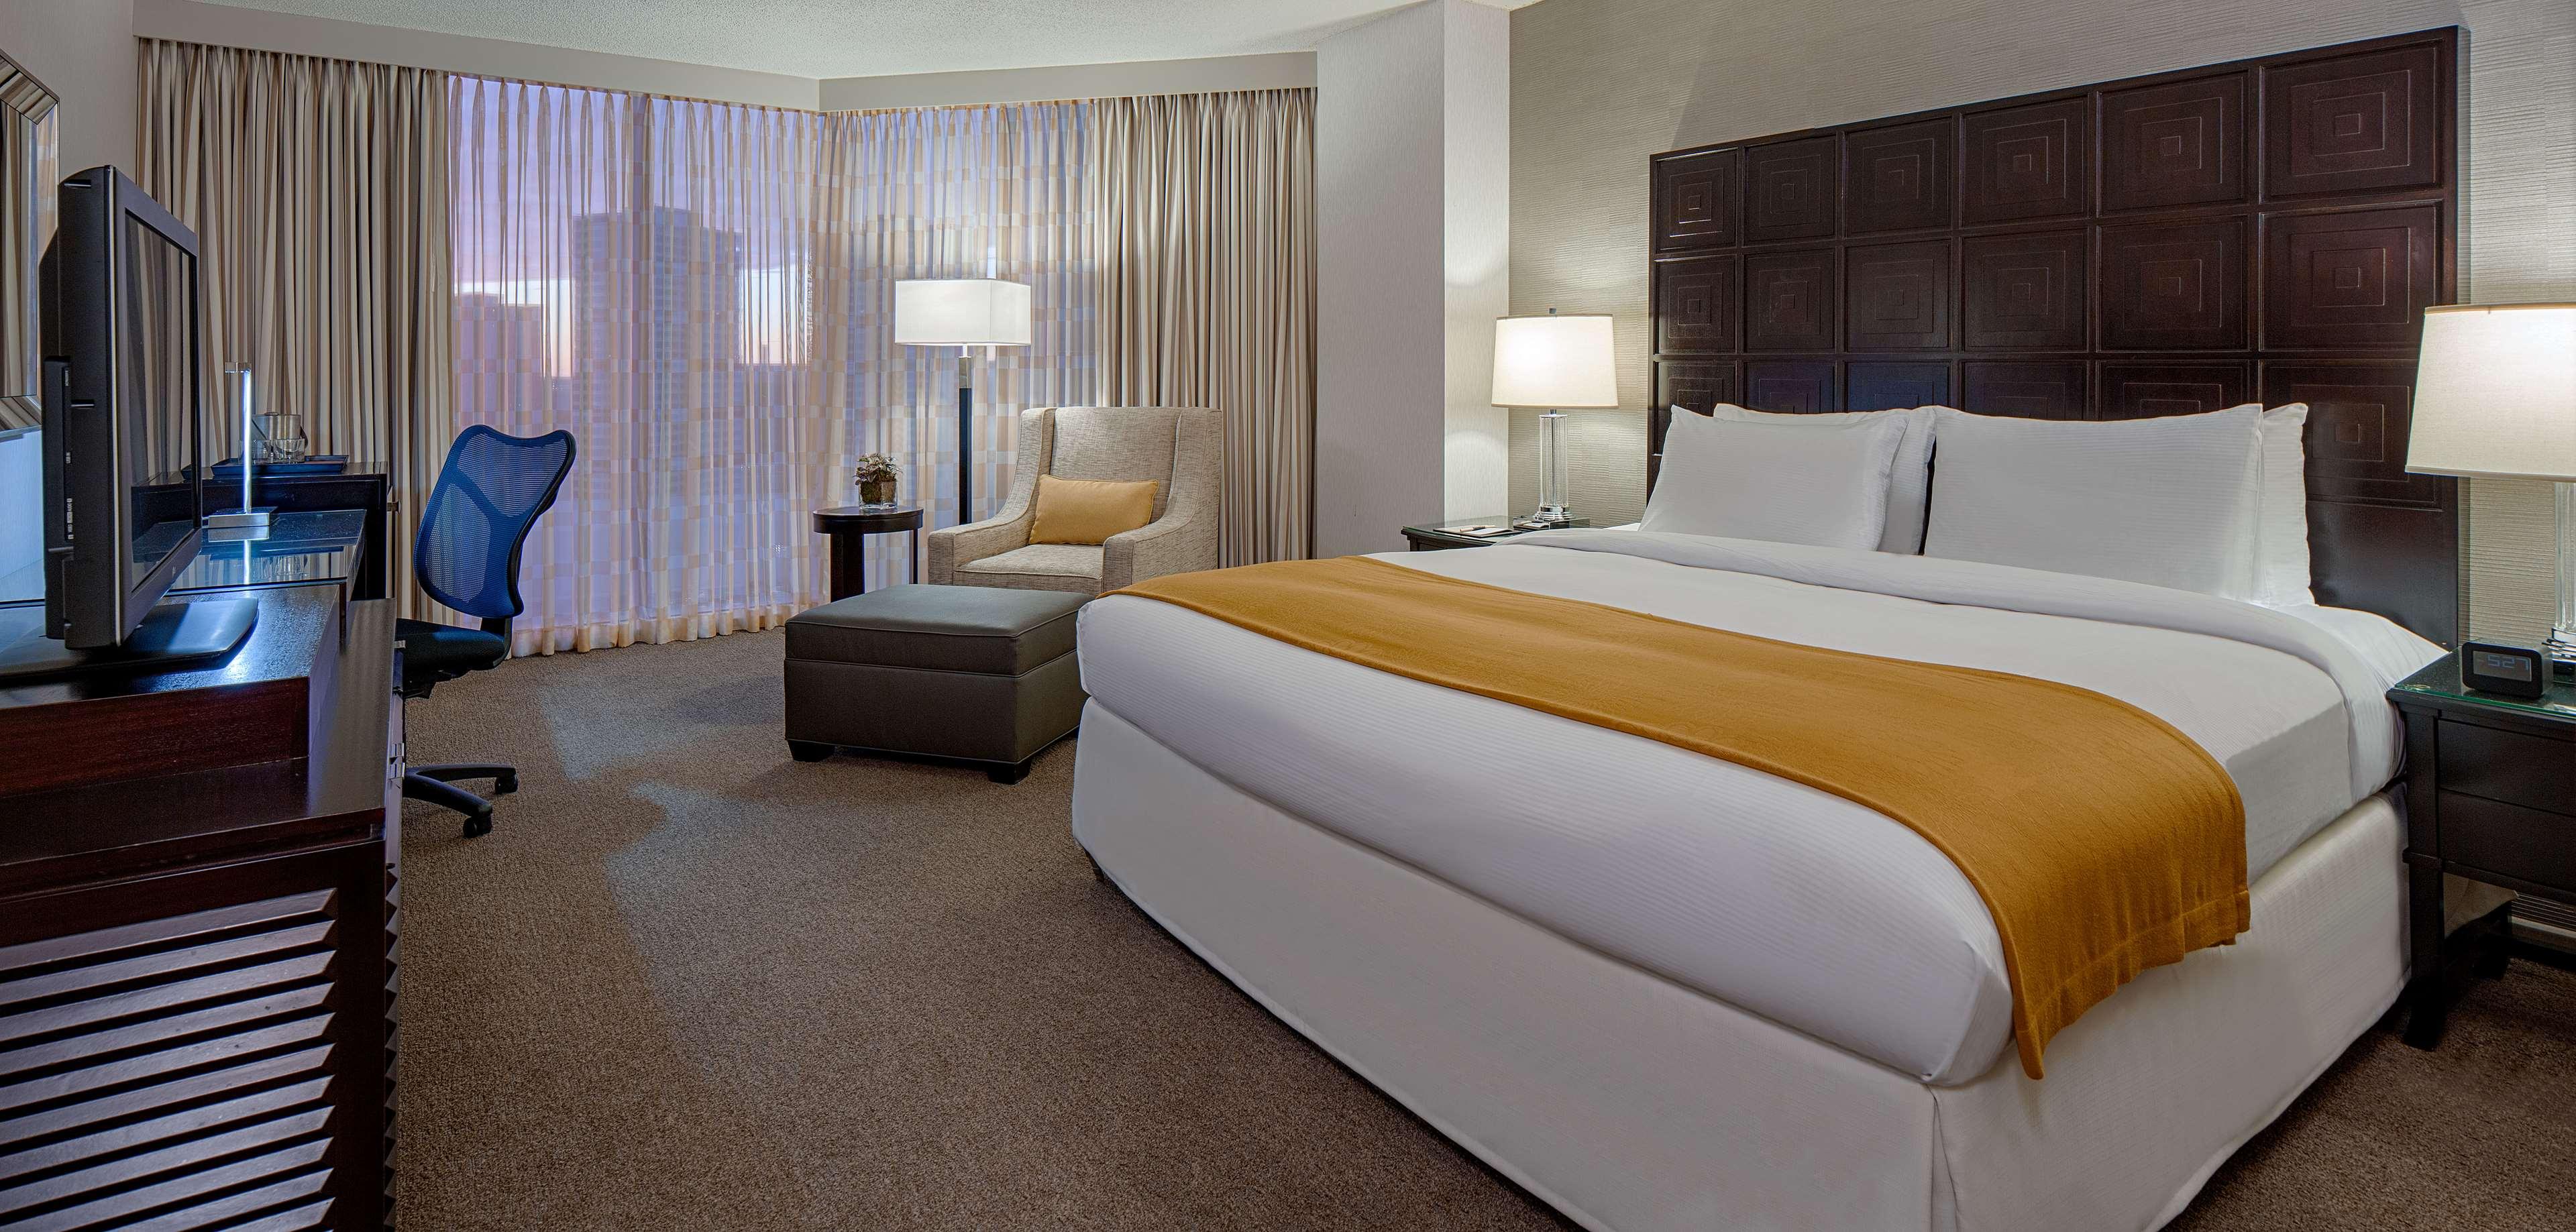 DoubleTree by Hilton Hotel Houston - Greenway Plaza image 17